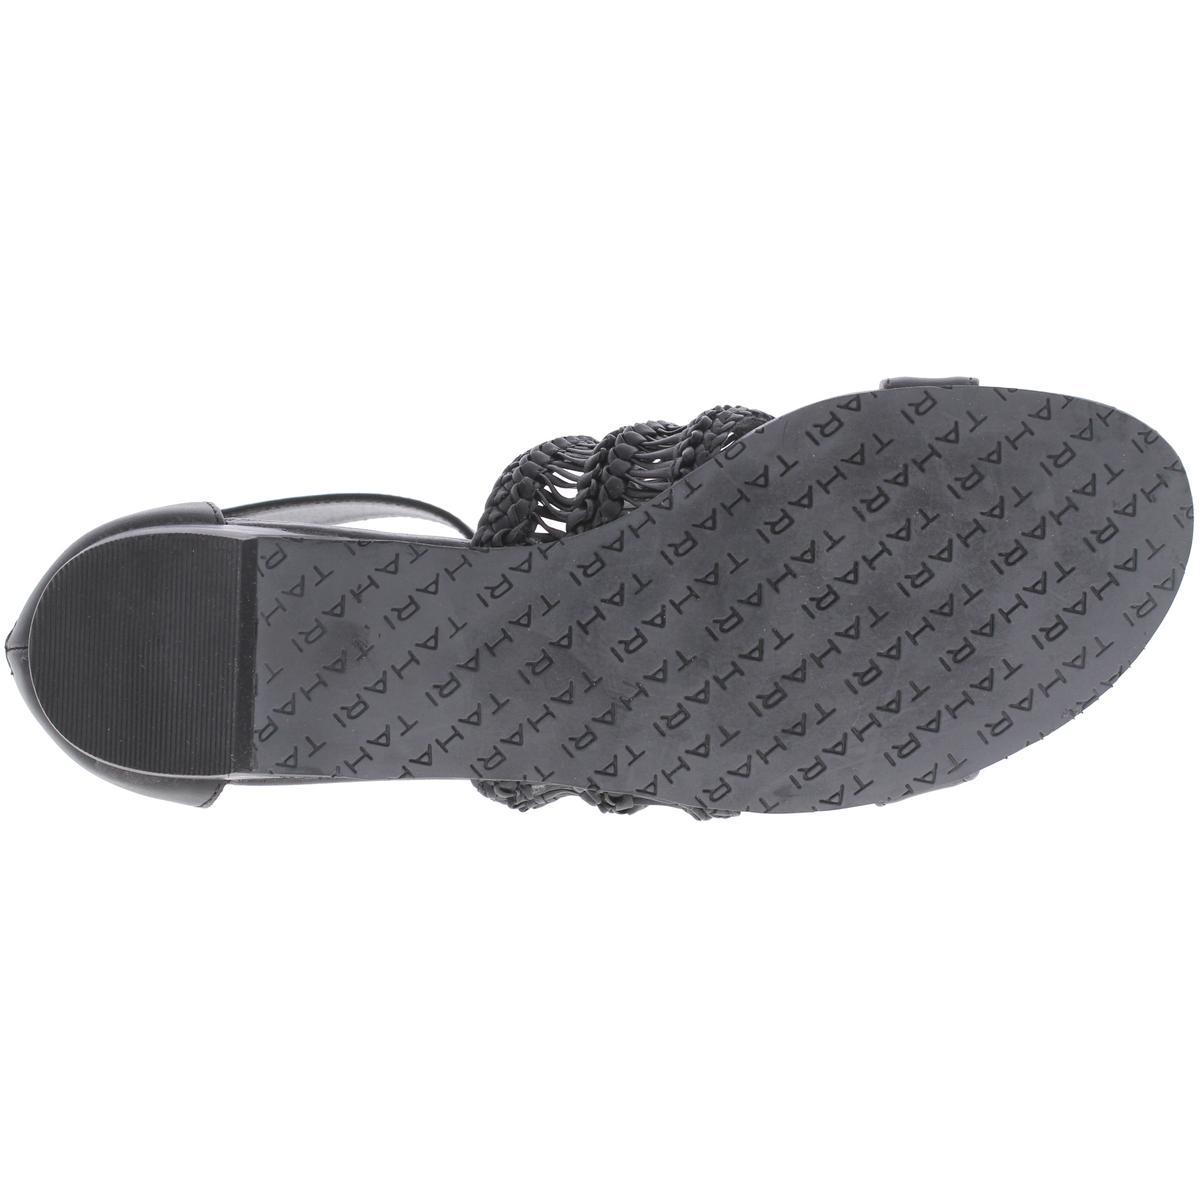 Tahari-Womens-Dorm-Open-Toe-Textured-Ankle-Flat-Sandals-Shoes-BHFO-3387 thumbnail 9